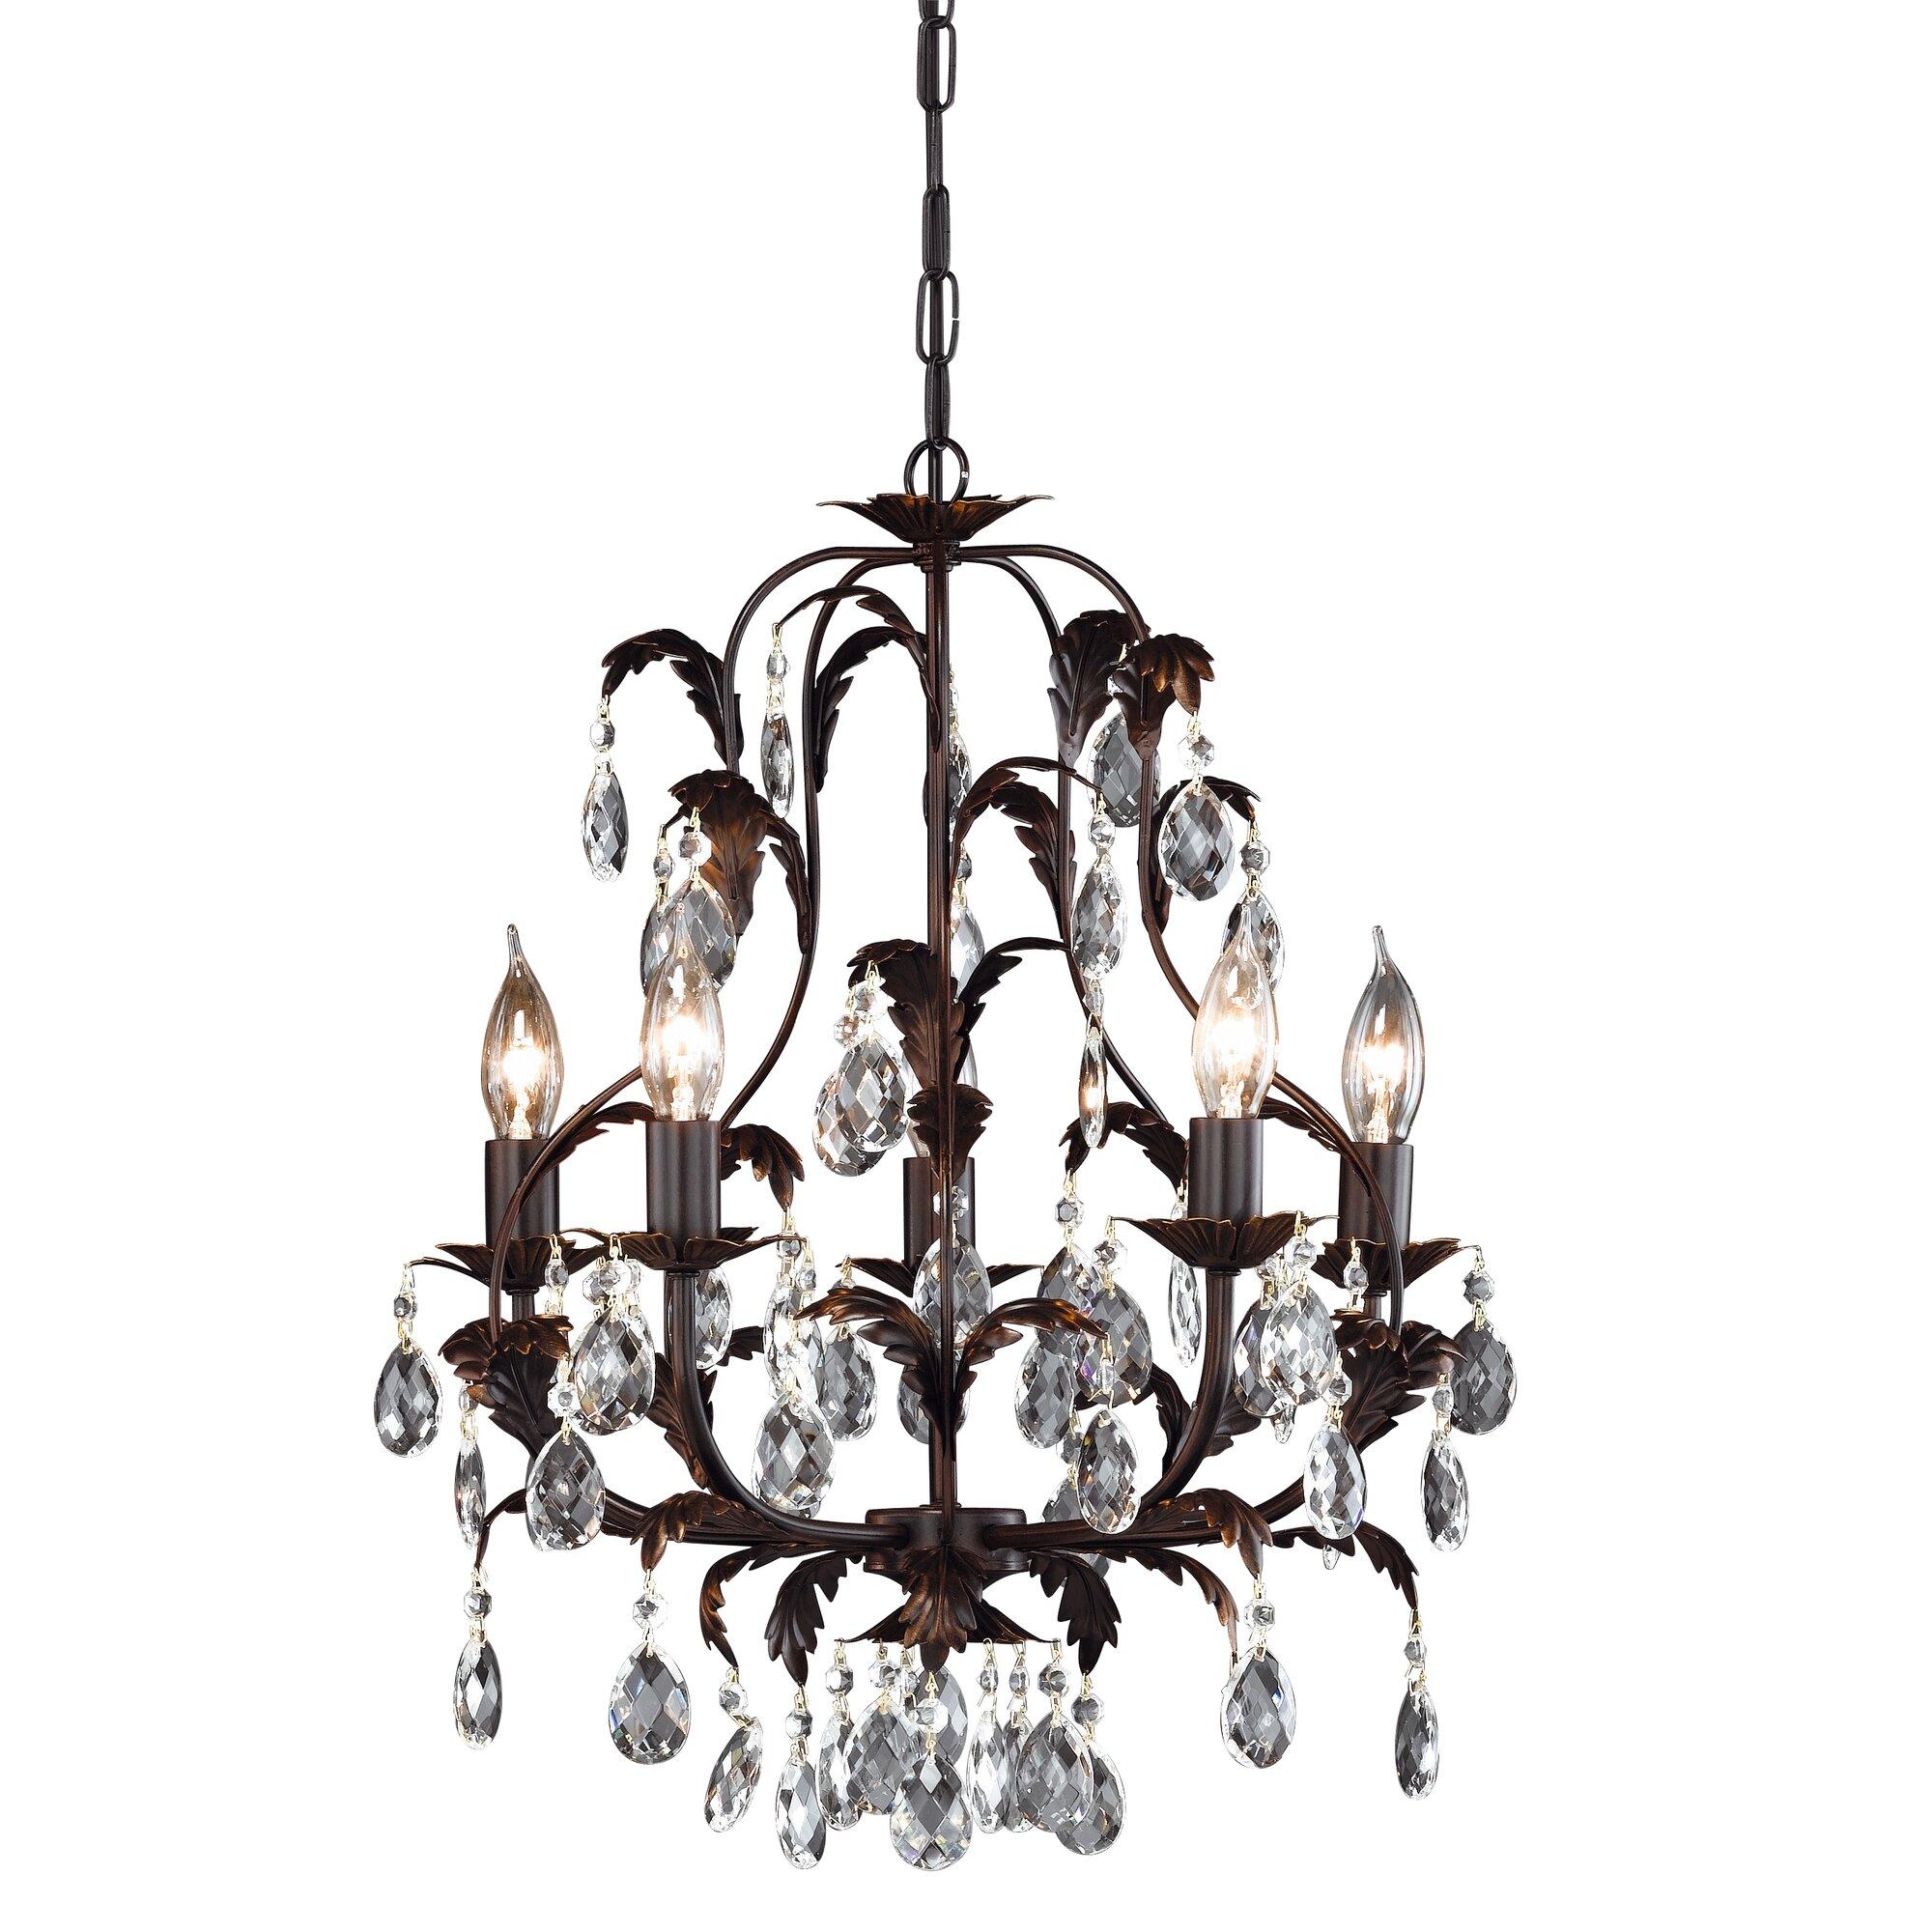 fischer honsel gmbh kronleuchter 5 flammig modena bewertungen. Black Bedroom Furniture Sets. Home Design Ideas